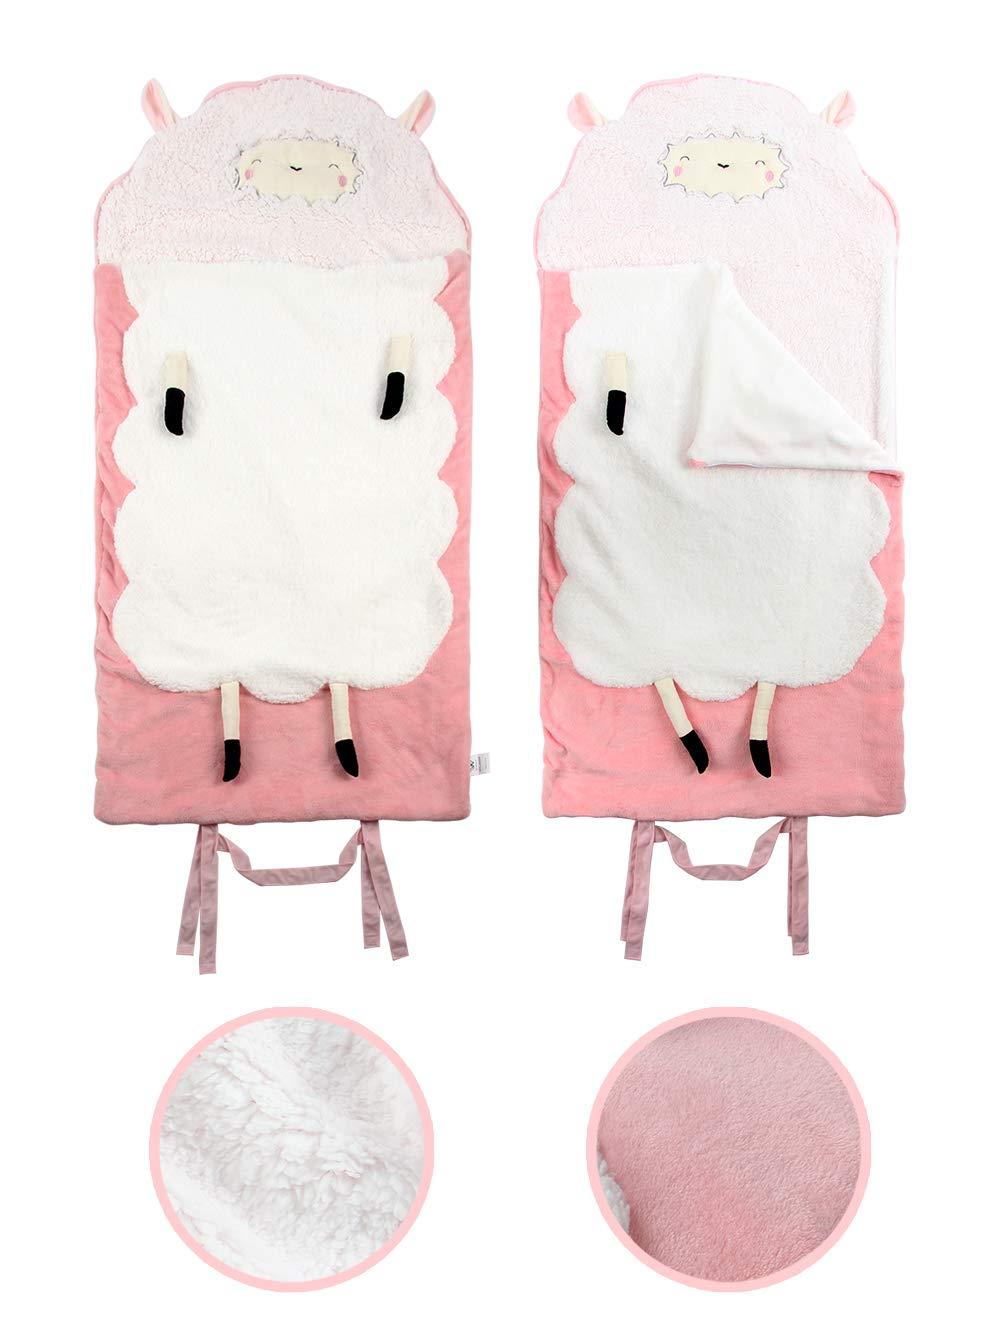 Warm Soft Cozy Baby Sherpa Sleep Sack Winthome Baby Winter Sleeping Bag Wrap Blanket 0-3 Years, PInk